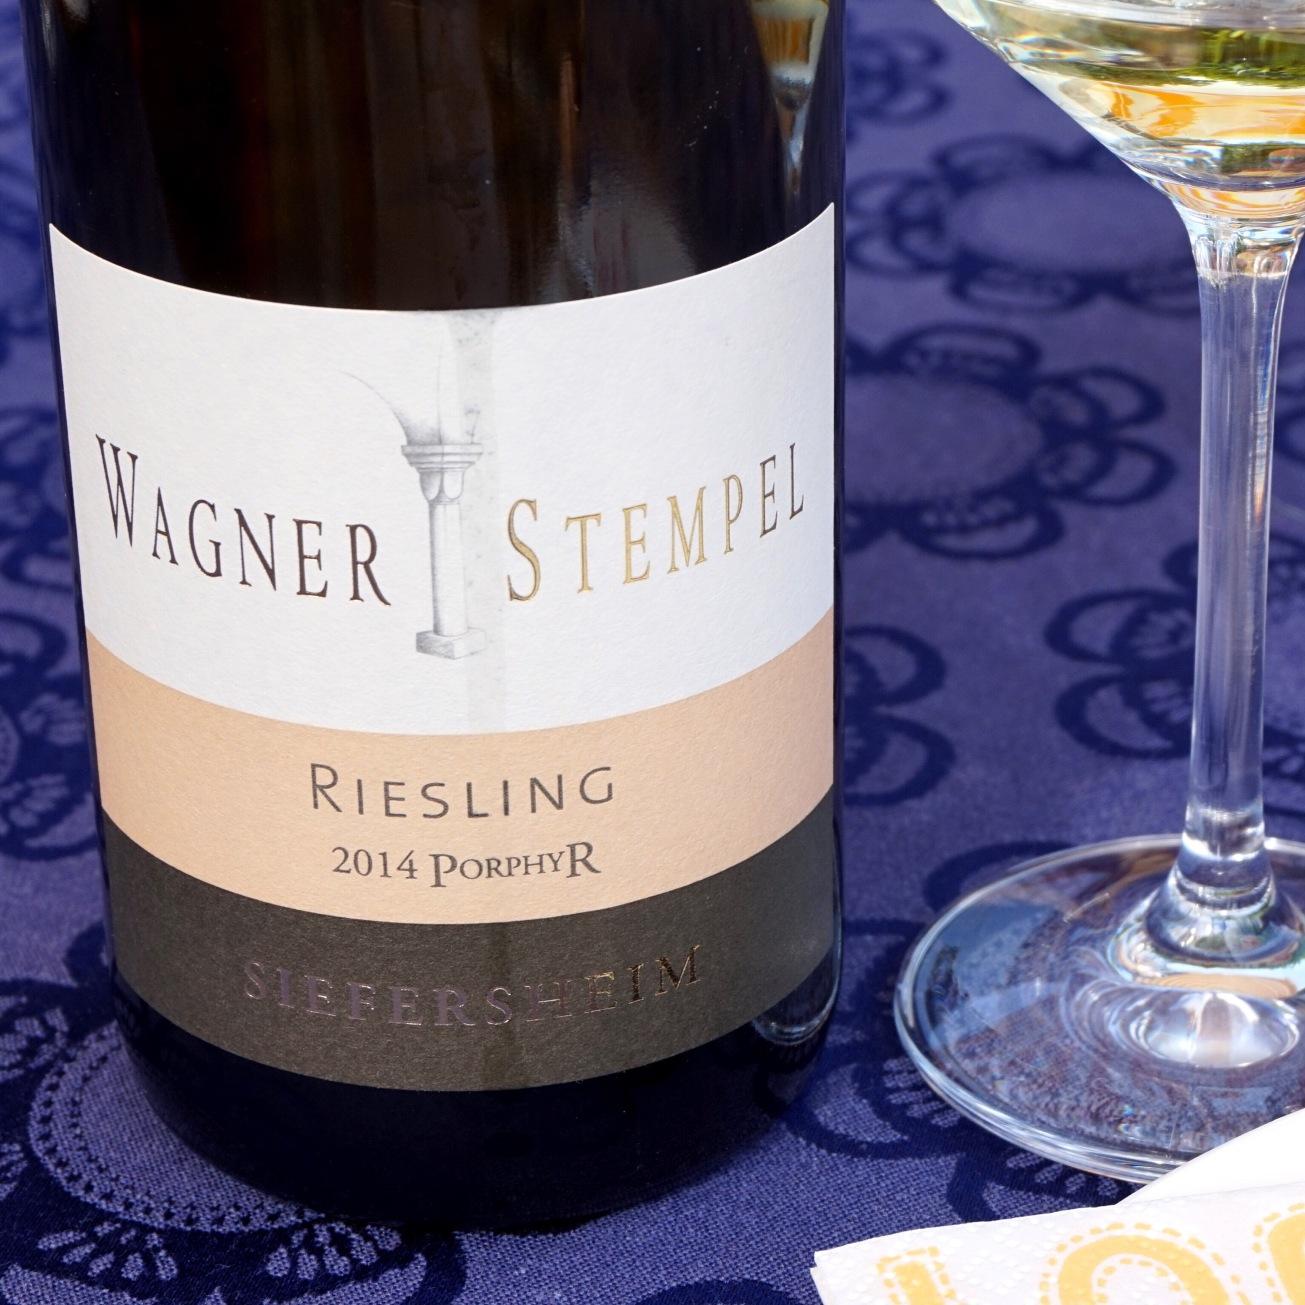 2013 Wagner-Stempel Siefersheimer Riesling Vom Porphyr Trocken